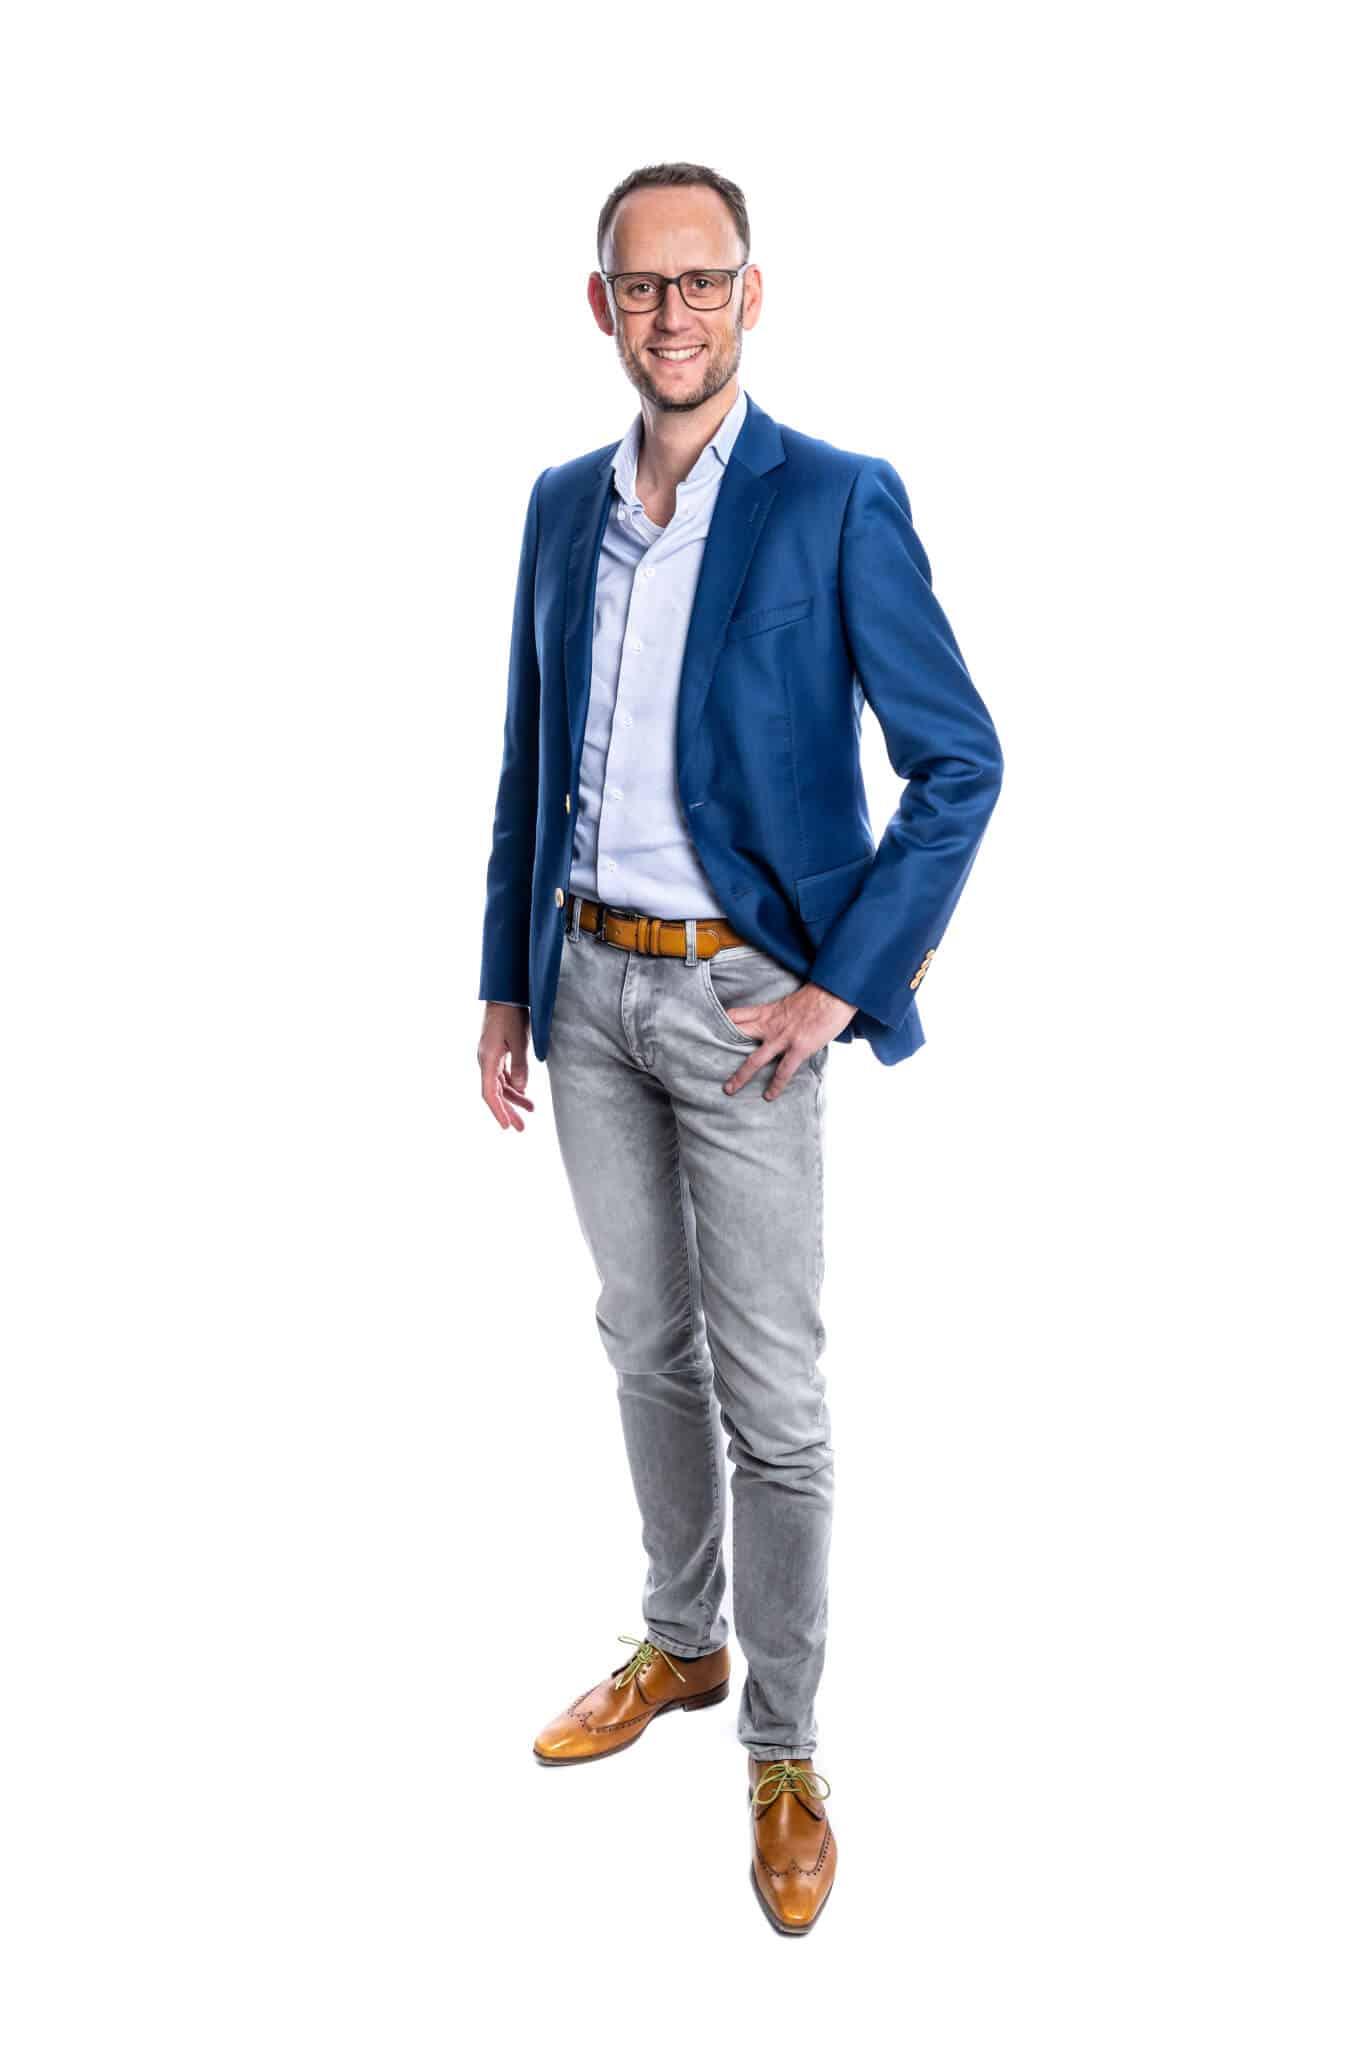 Emile-Jansen